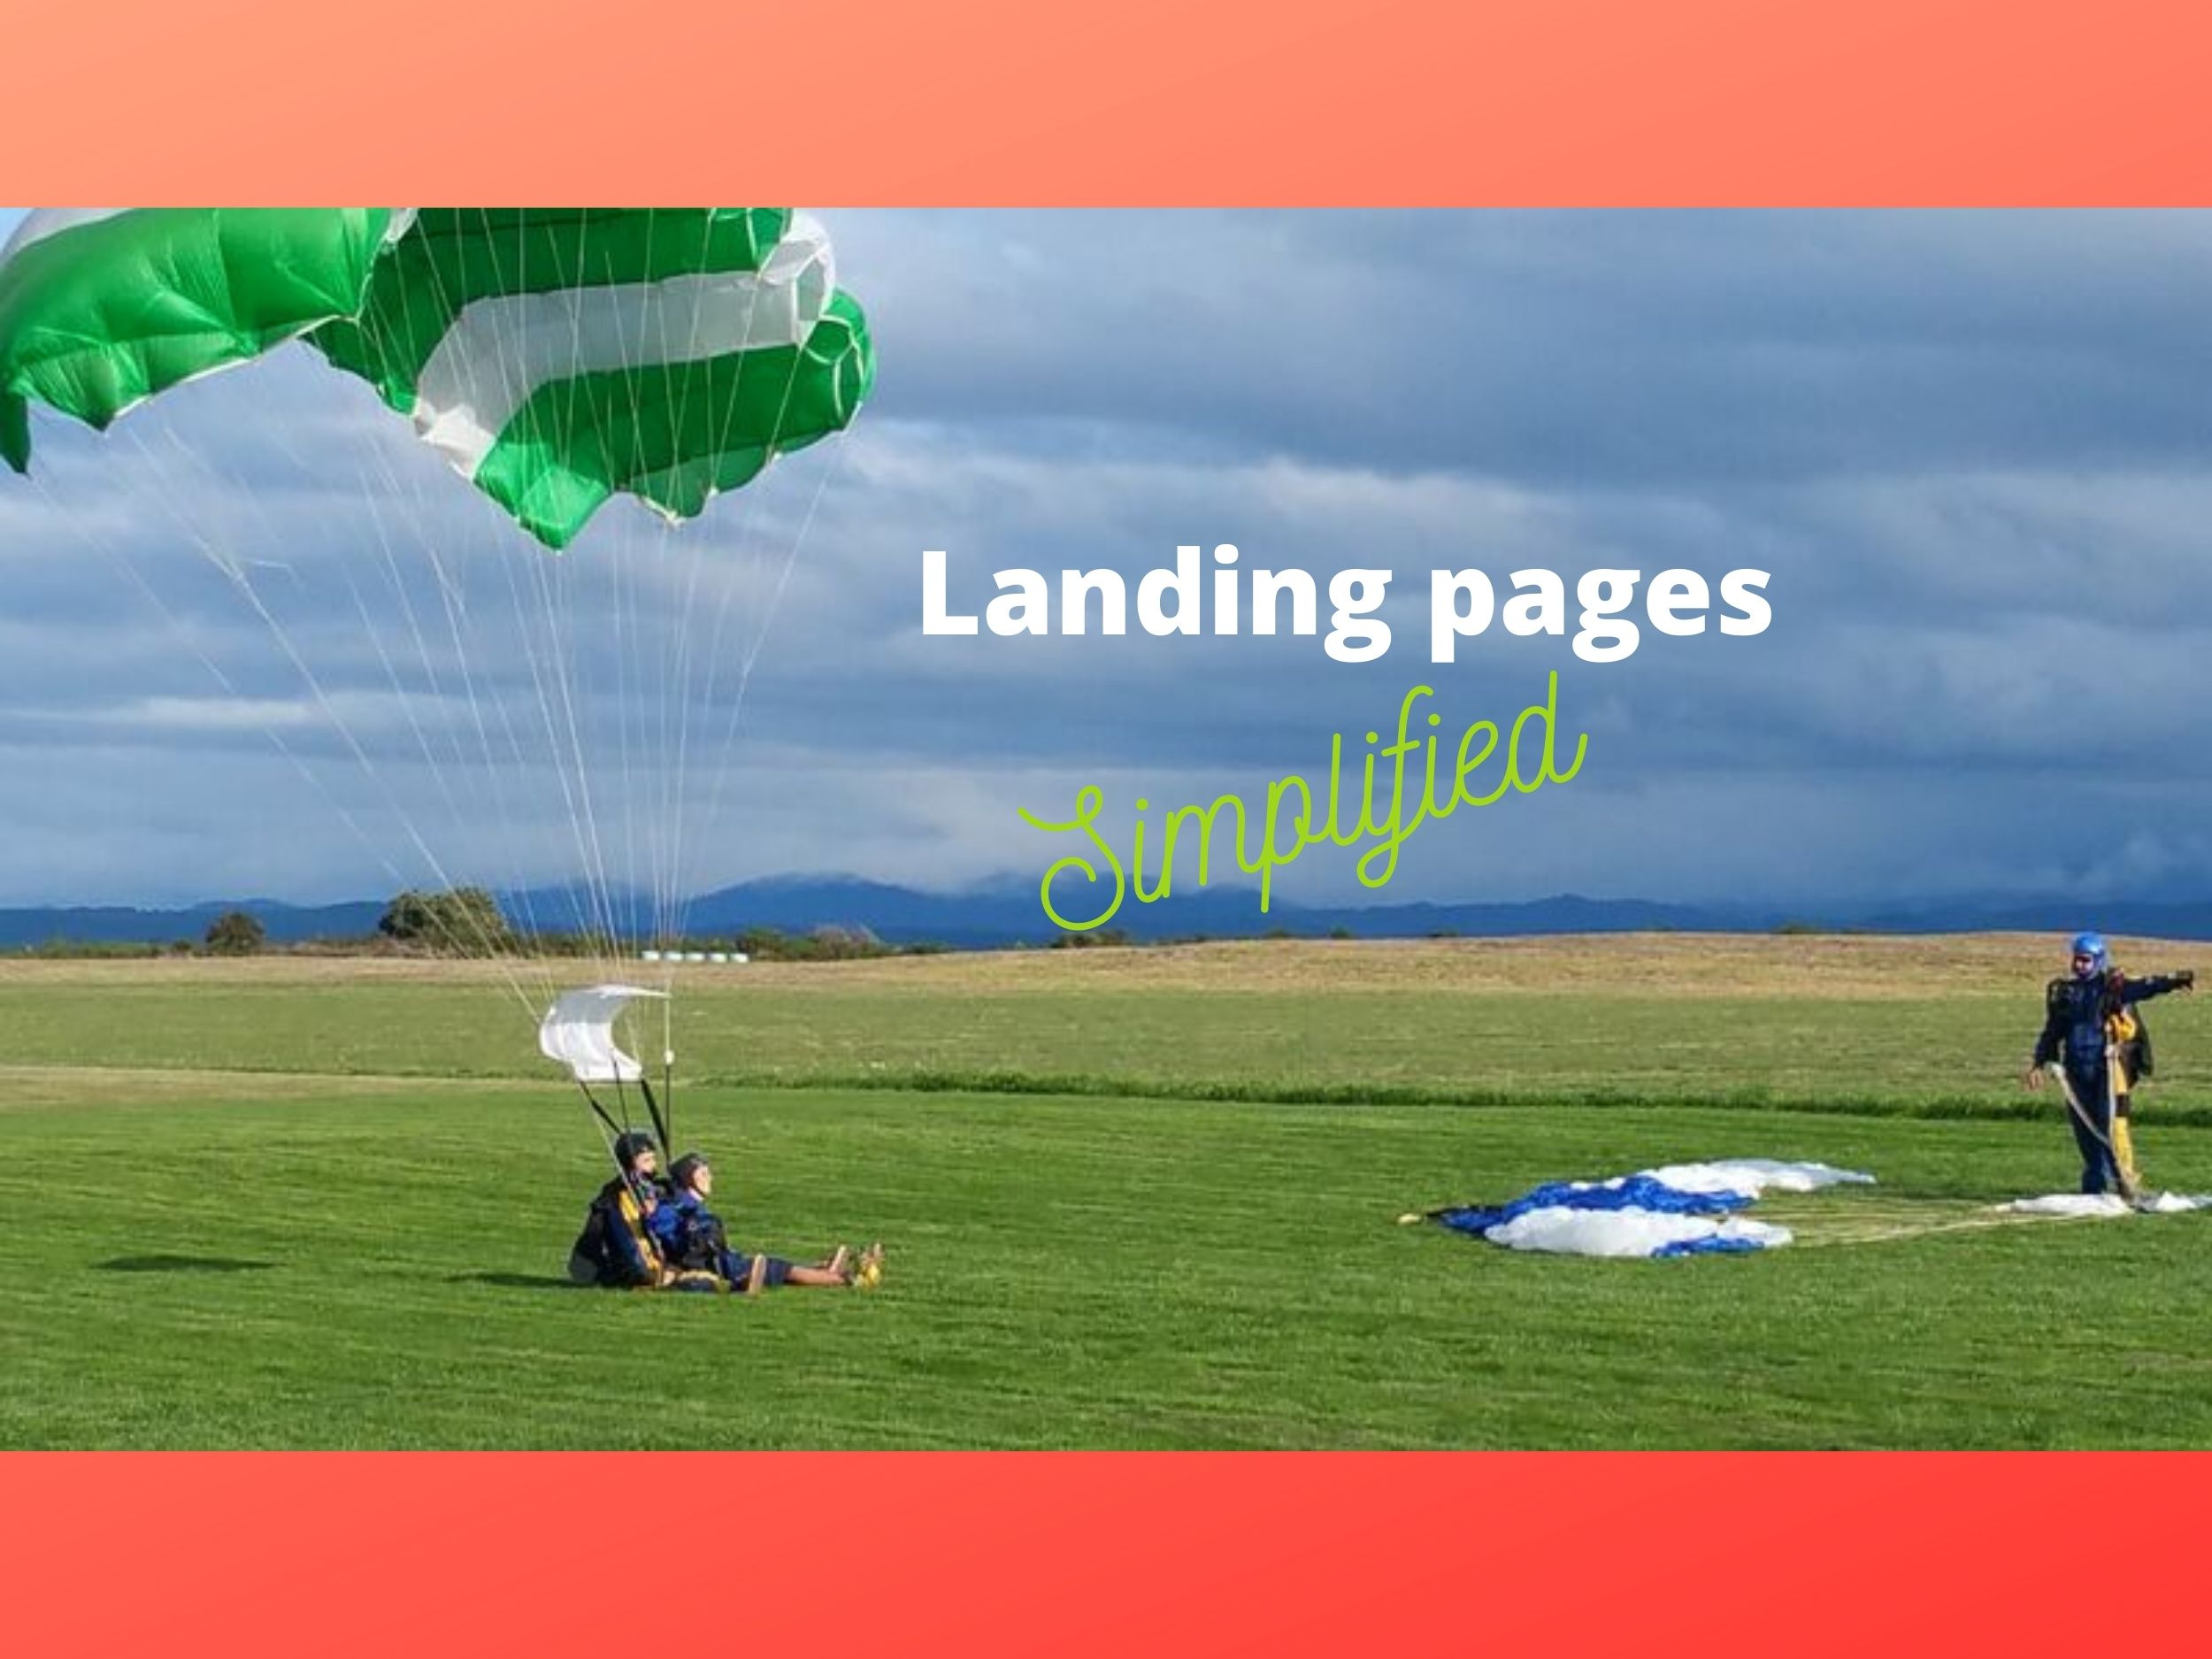 Tandem skydivers landing